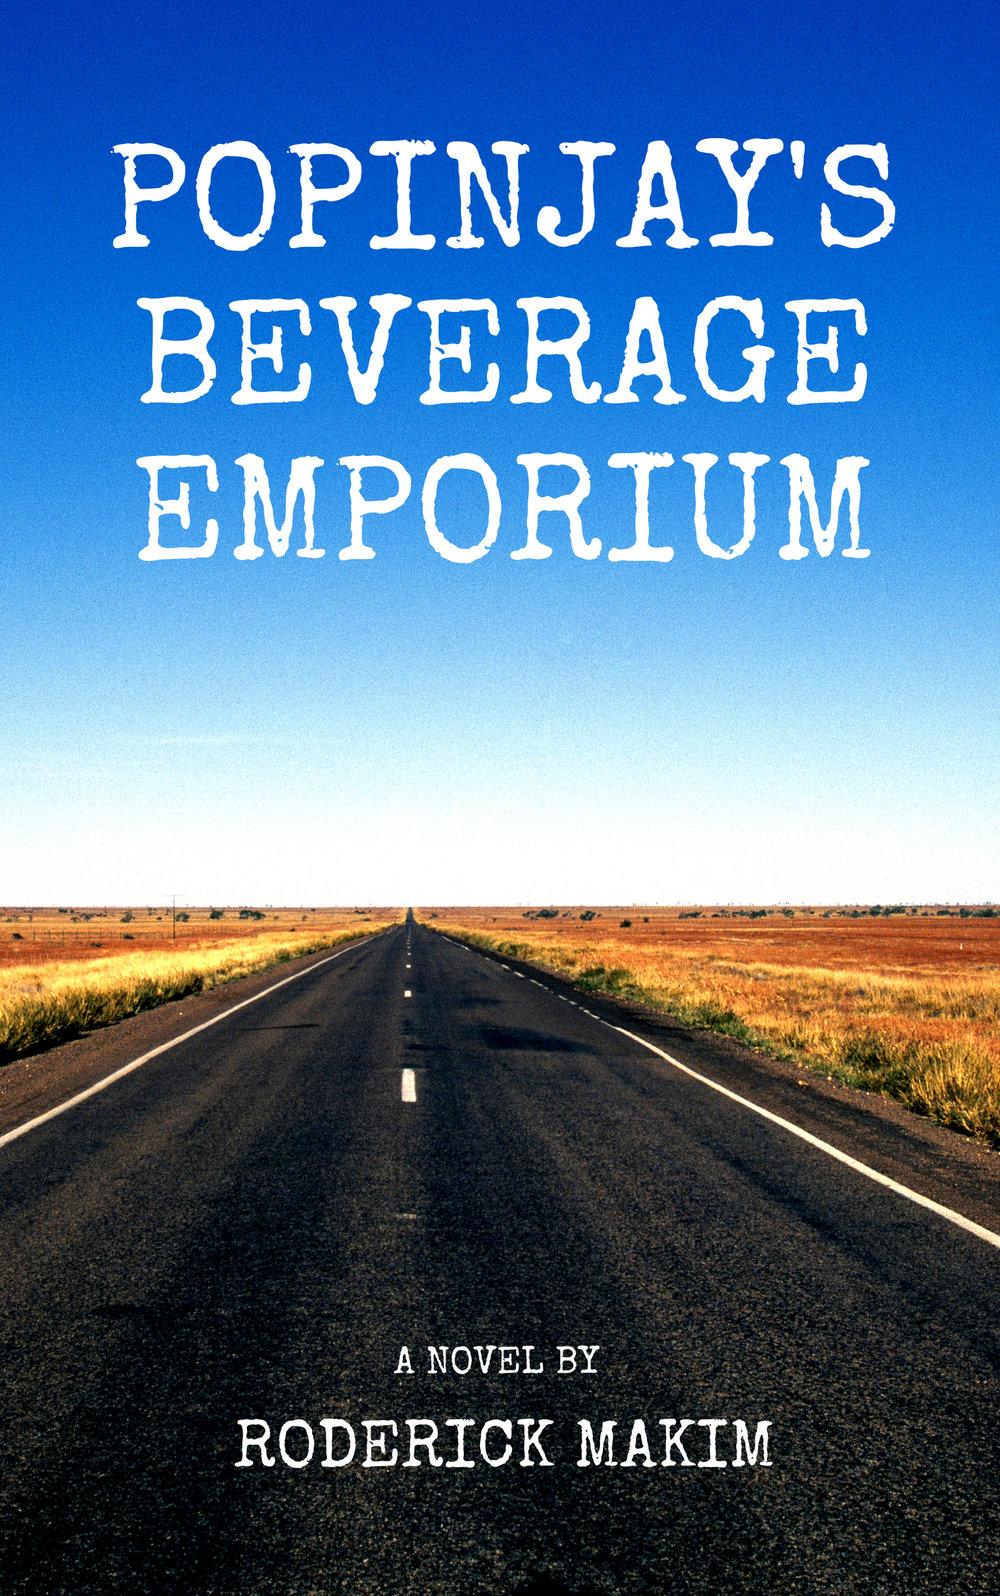 Popinjay's beverage emporium (3).jpg